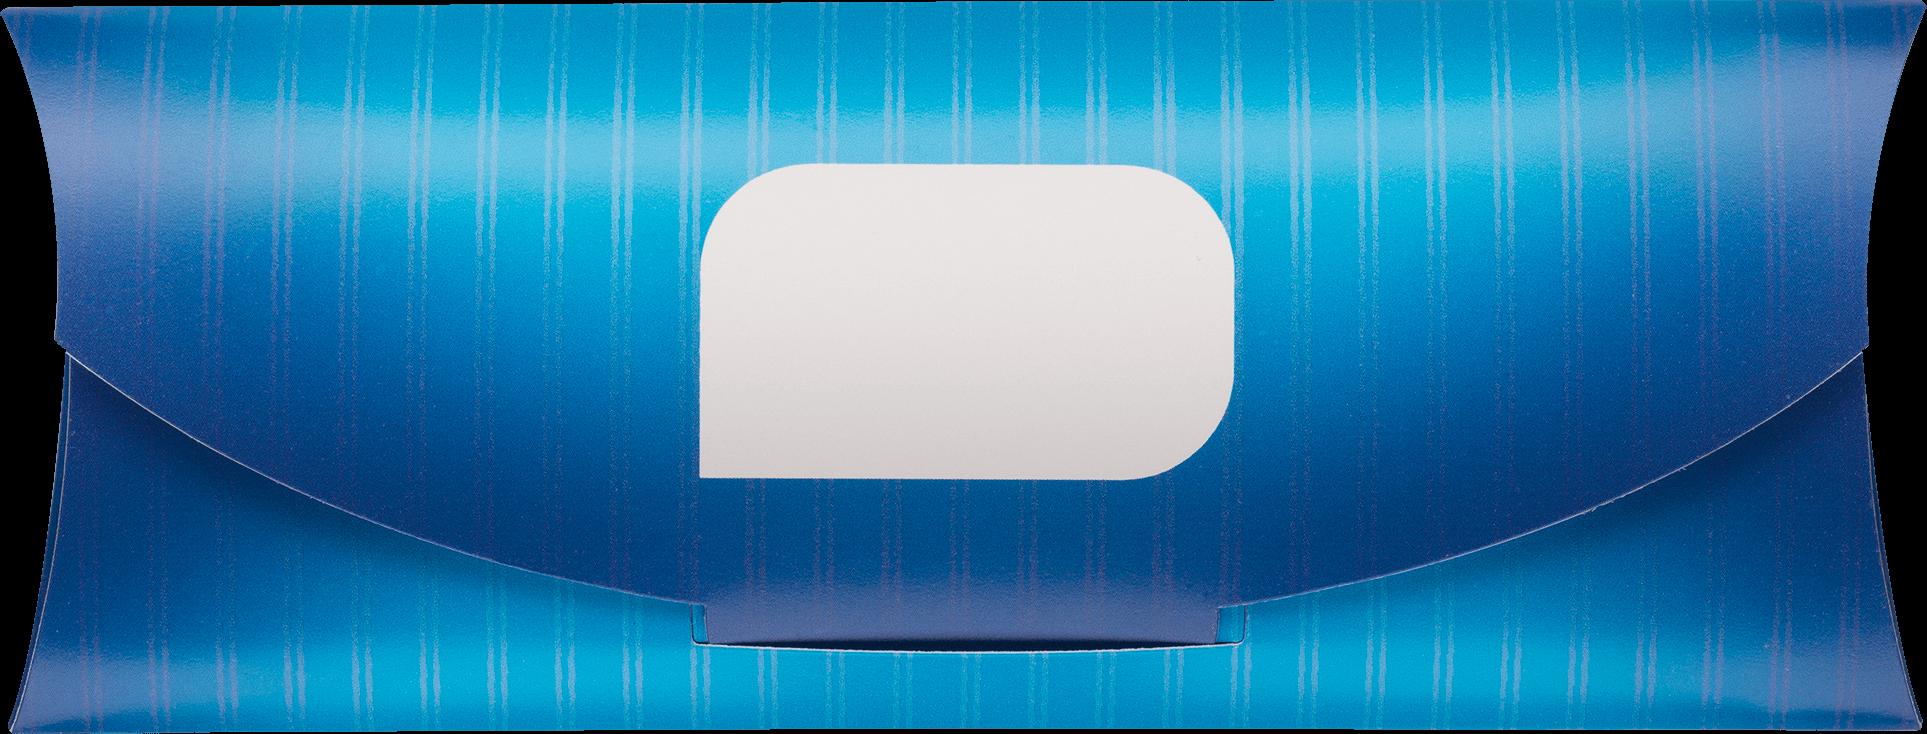 STABILO_GIFT_BOX_Blue_Stripes_Front_OriginalSize_sRGB_300dpi